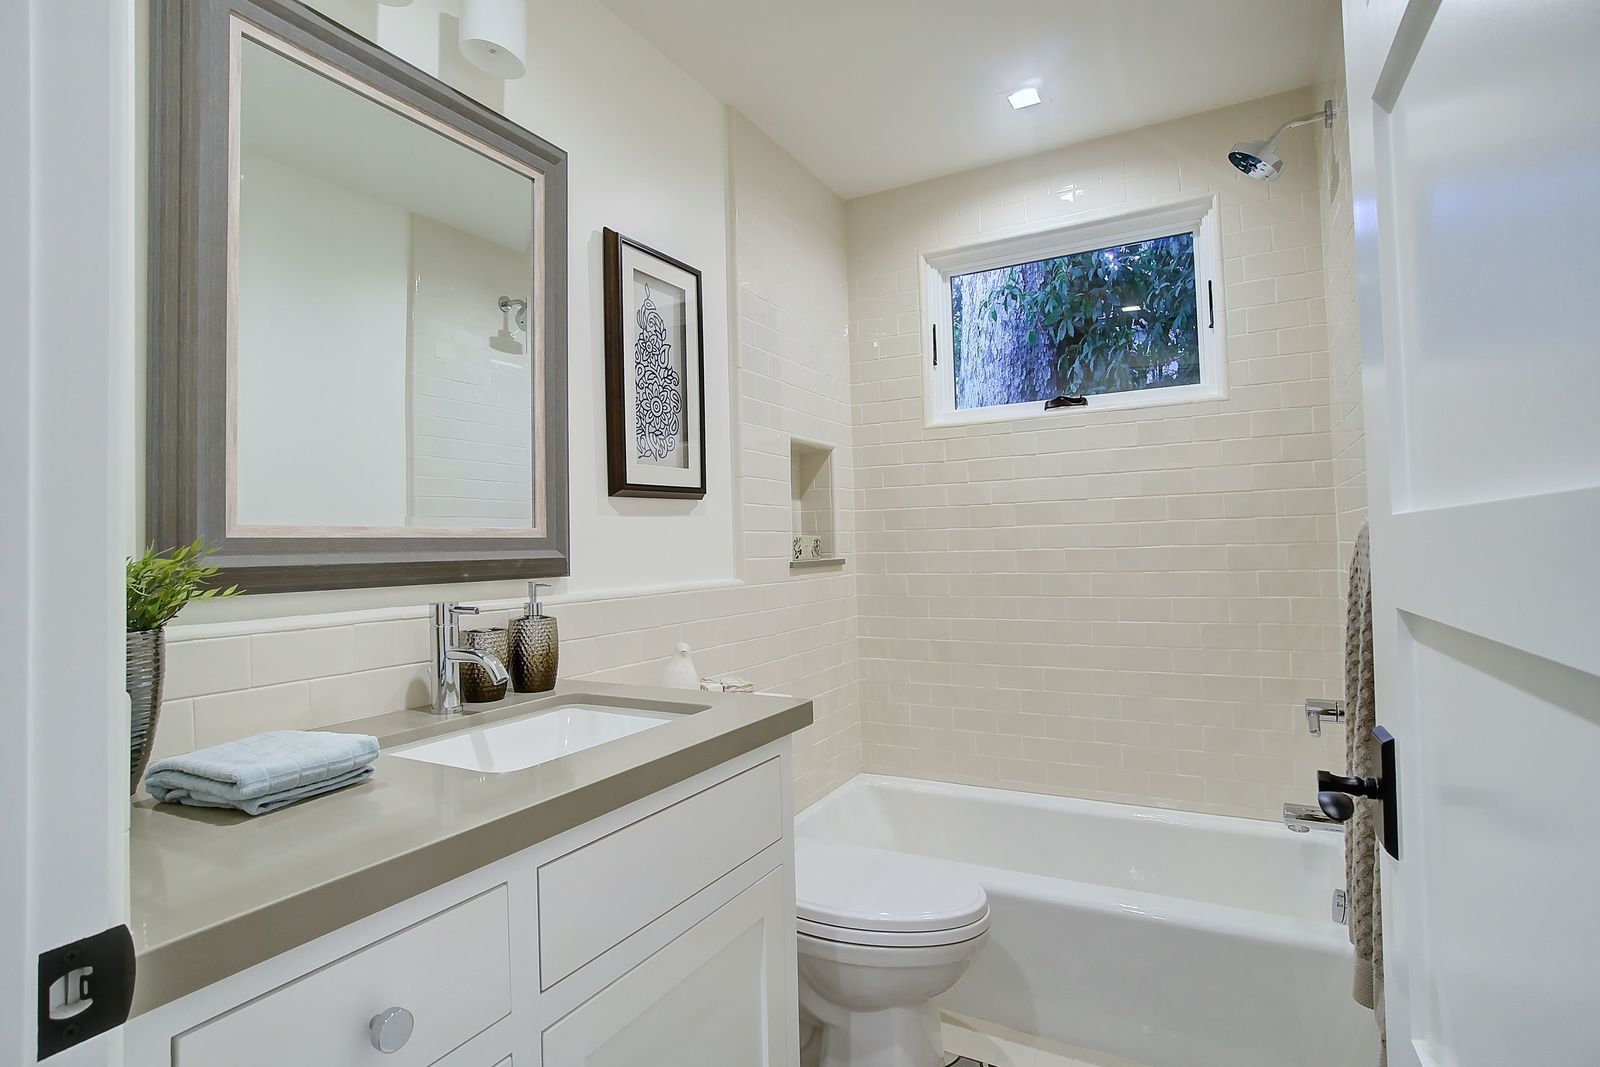 contemporary-spanish-bathroom-tile-tub-shower-premier-general-contractors.jpg